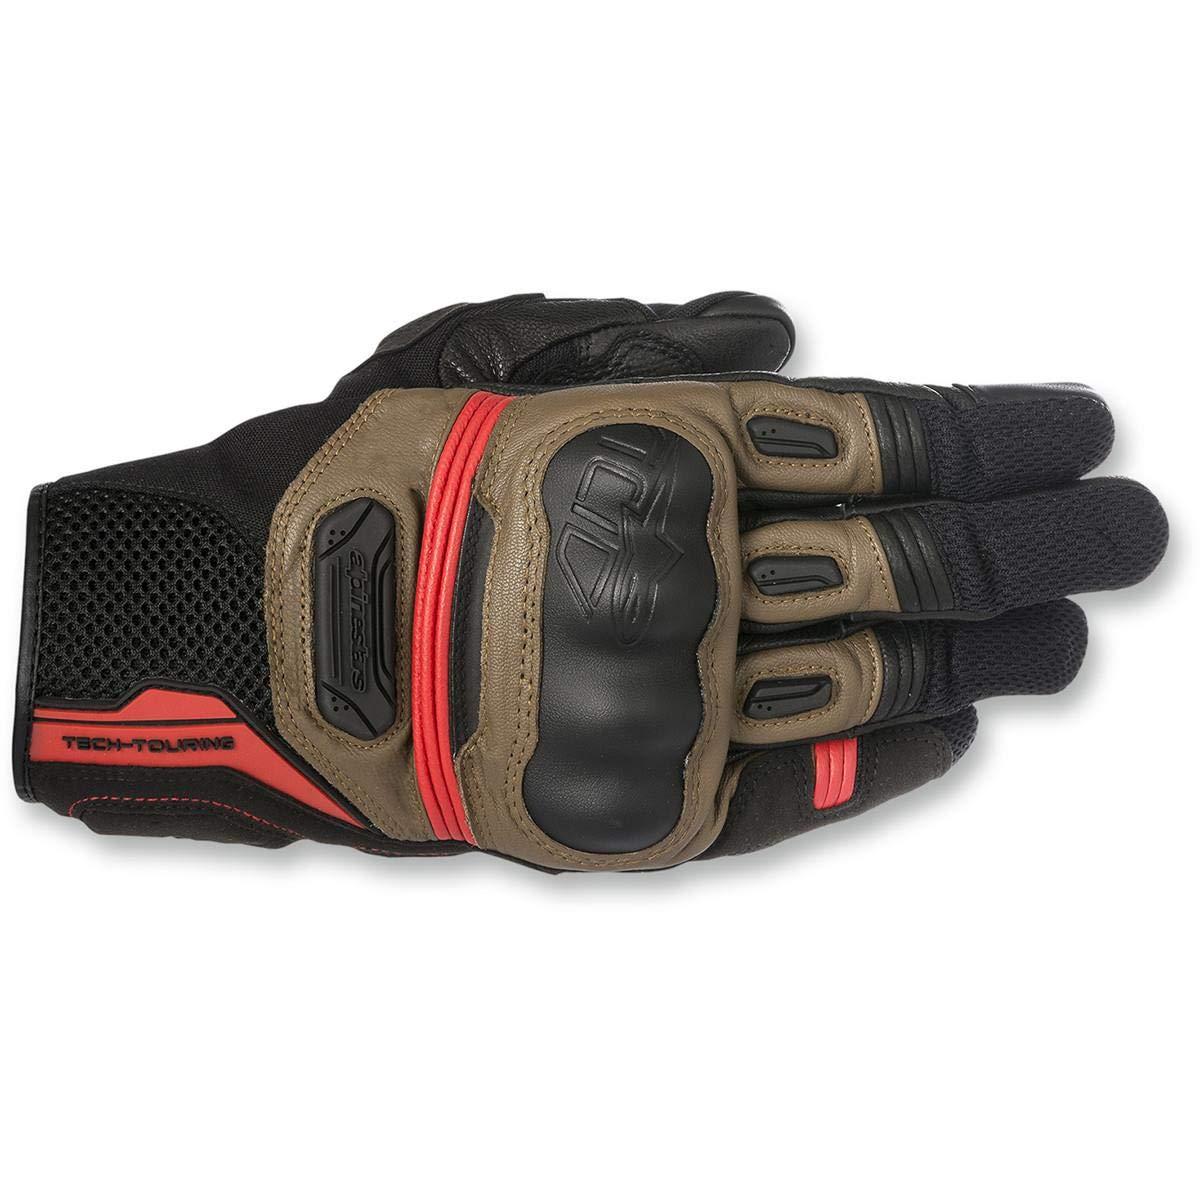 Hd xxx leather gloves